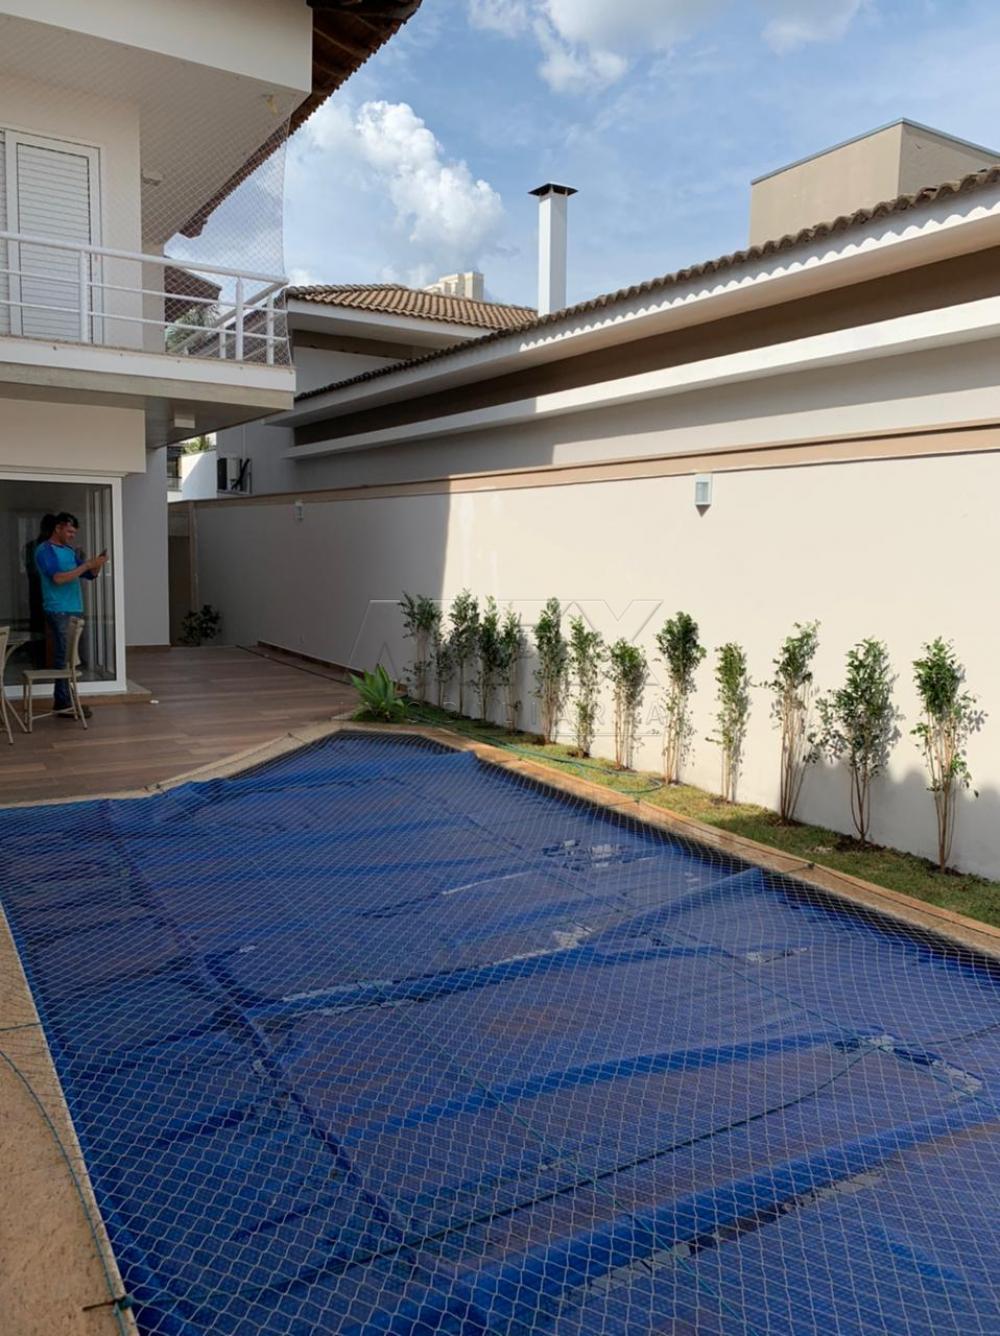 Alugar Casa / Condomínio em Bauru R$ 7.000,00 - Foto 24